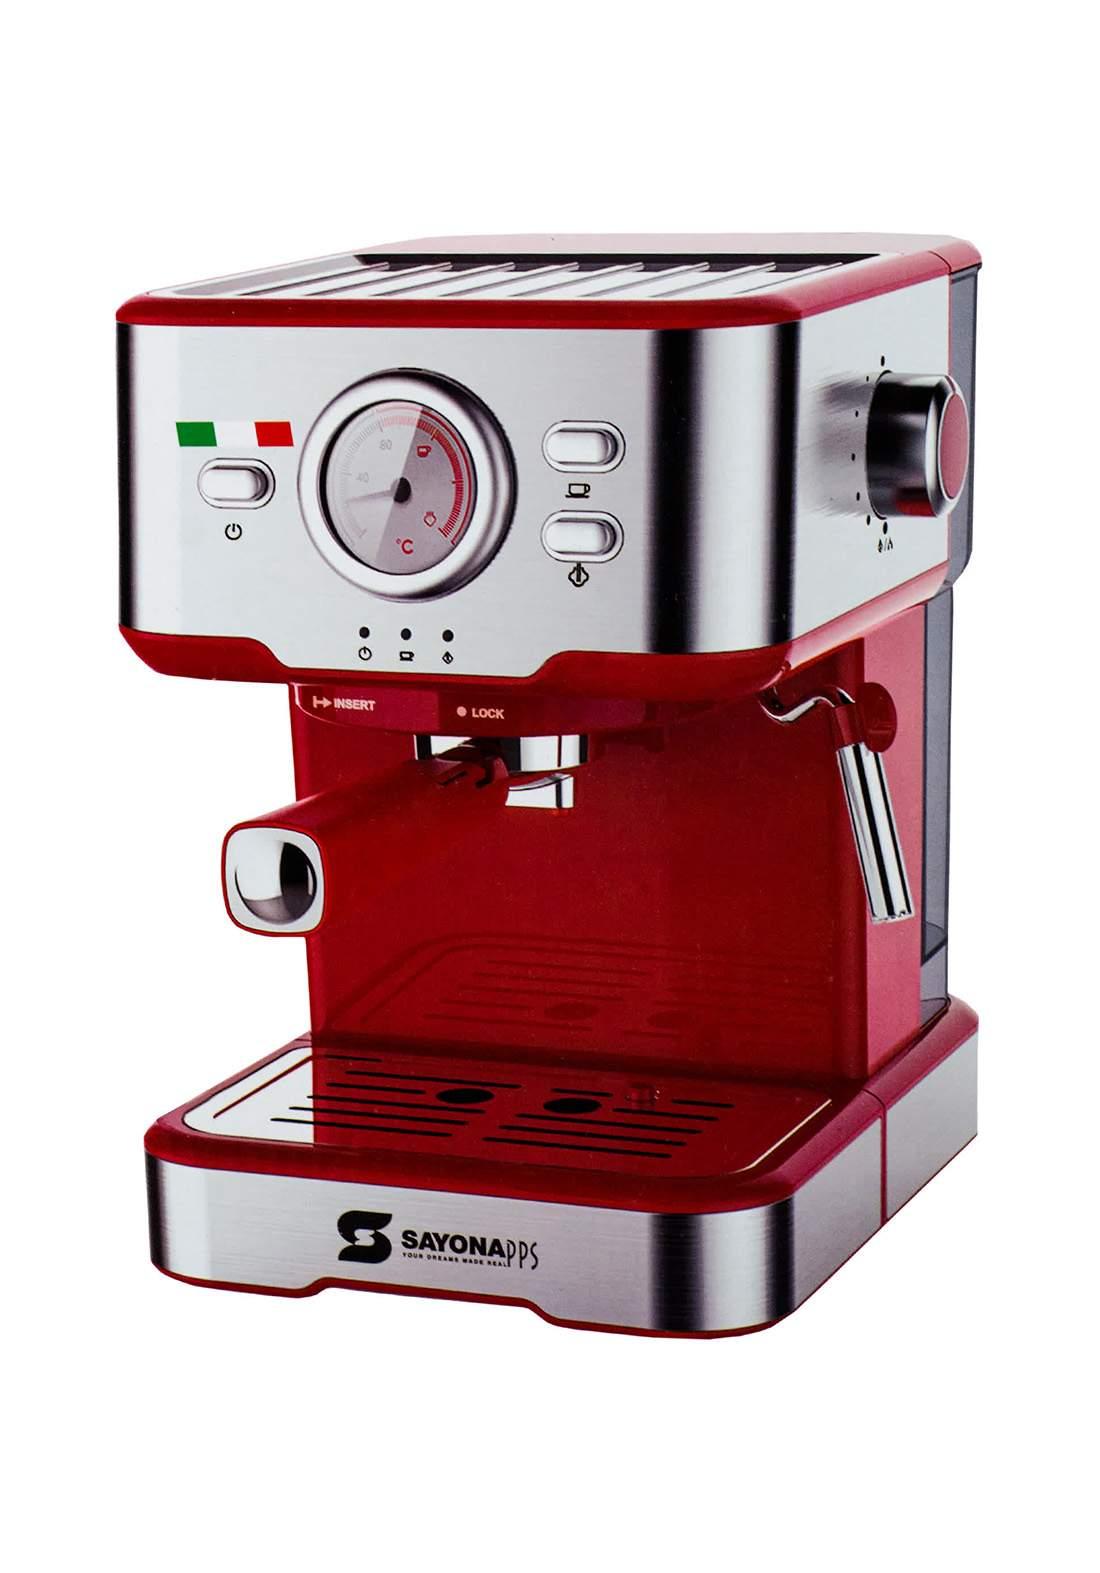 Sayona 4316 Coffee Machine 1100 Watt ماكنة صنع قهوة